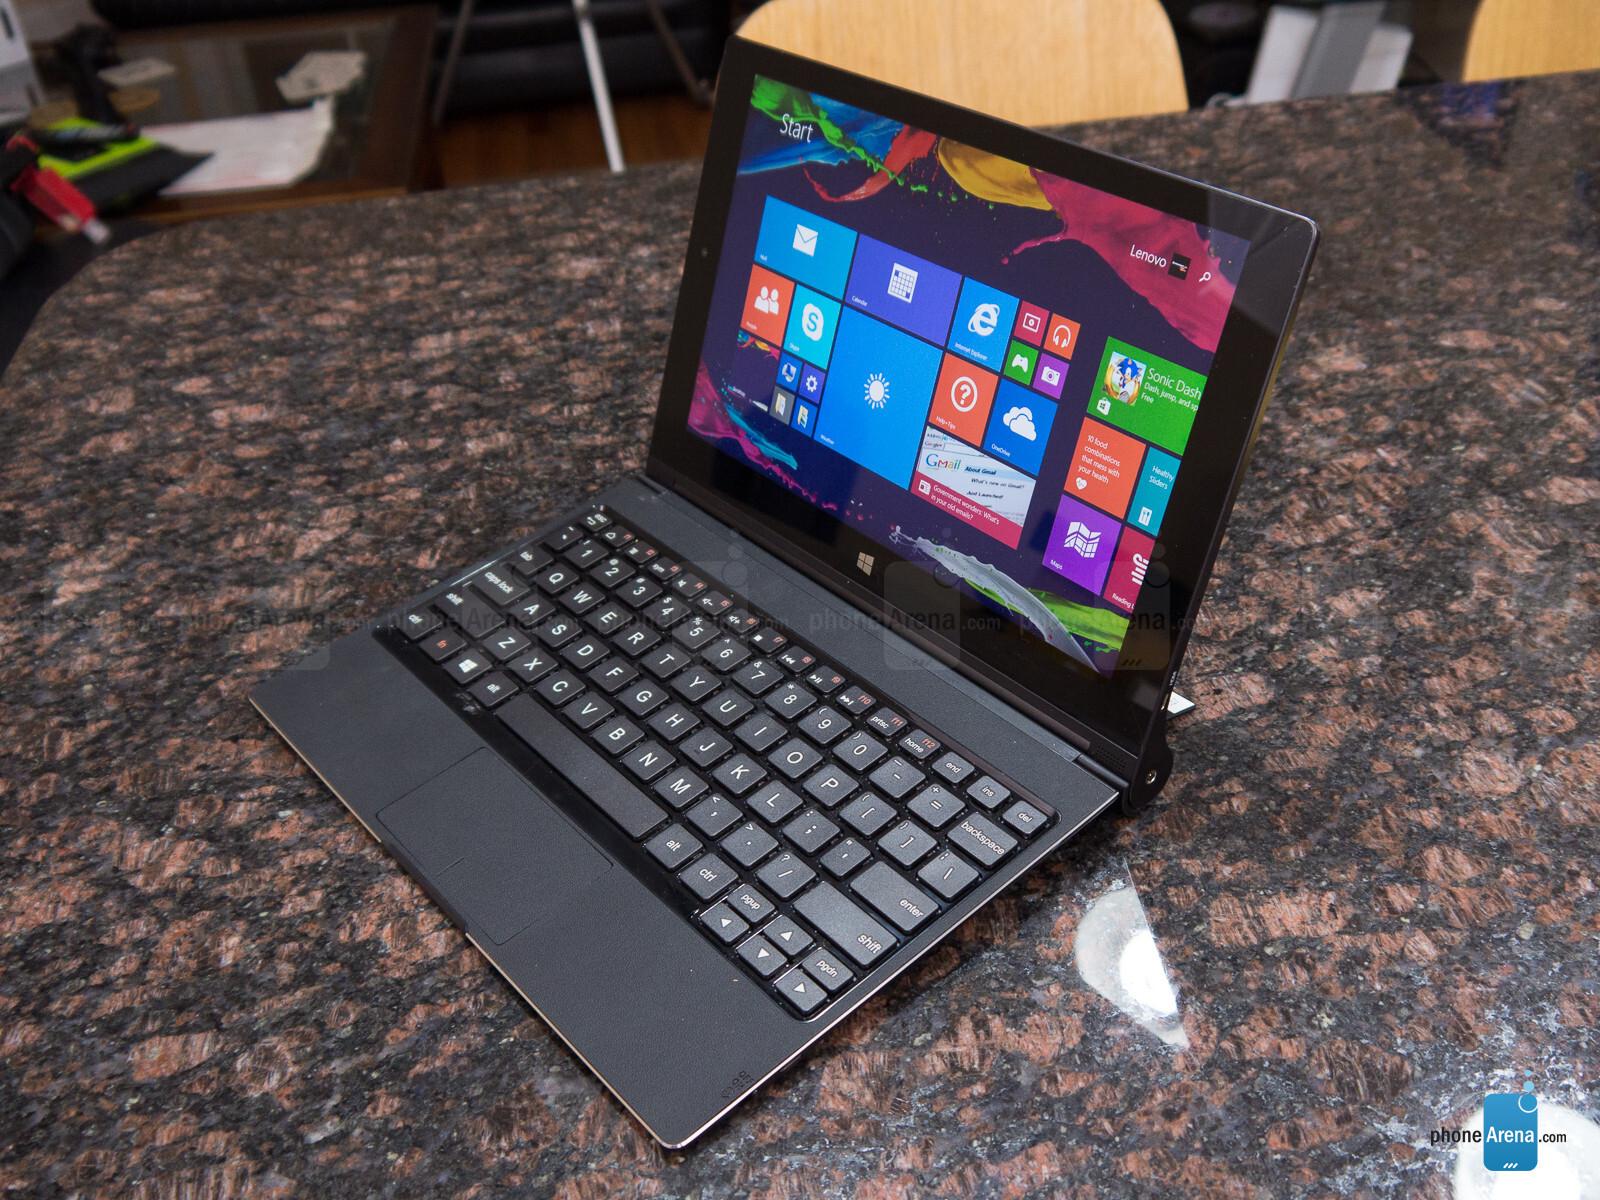 lenovo yoga tablet 2 10 1 inch windows review. Black Bedroom Furniture Sets. Home Design Ideas